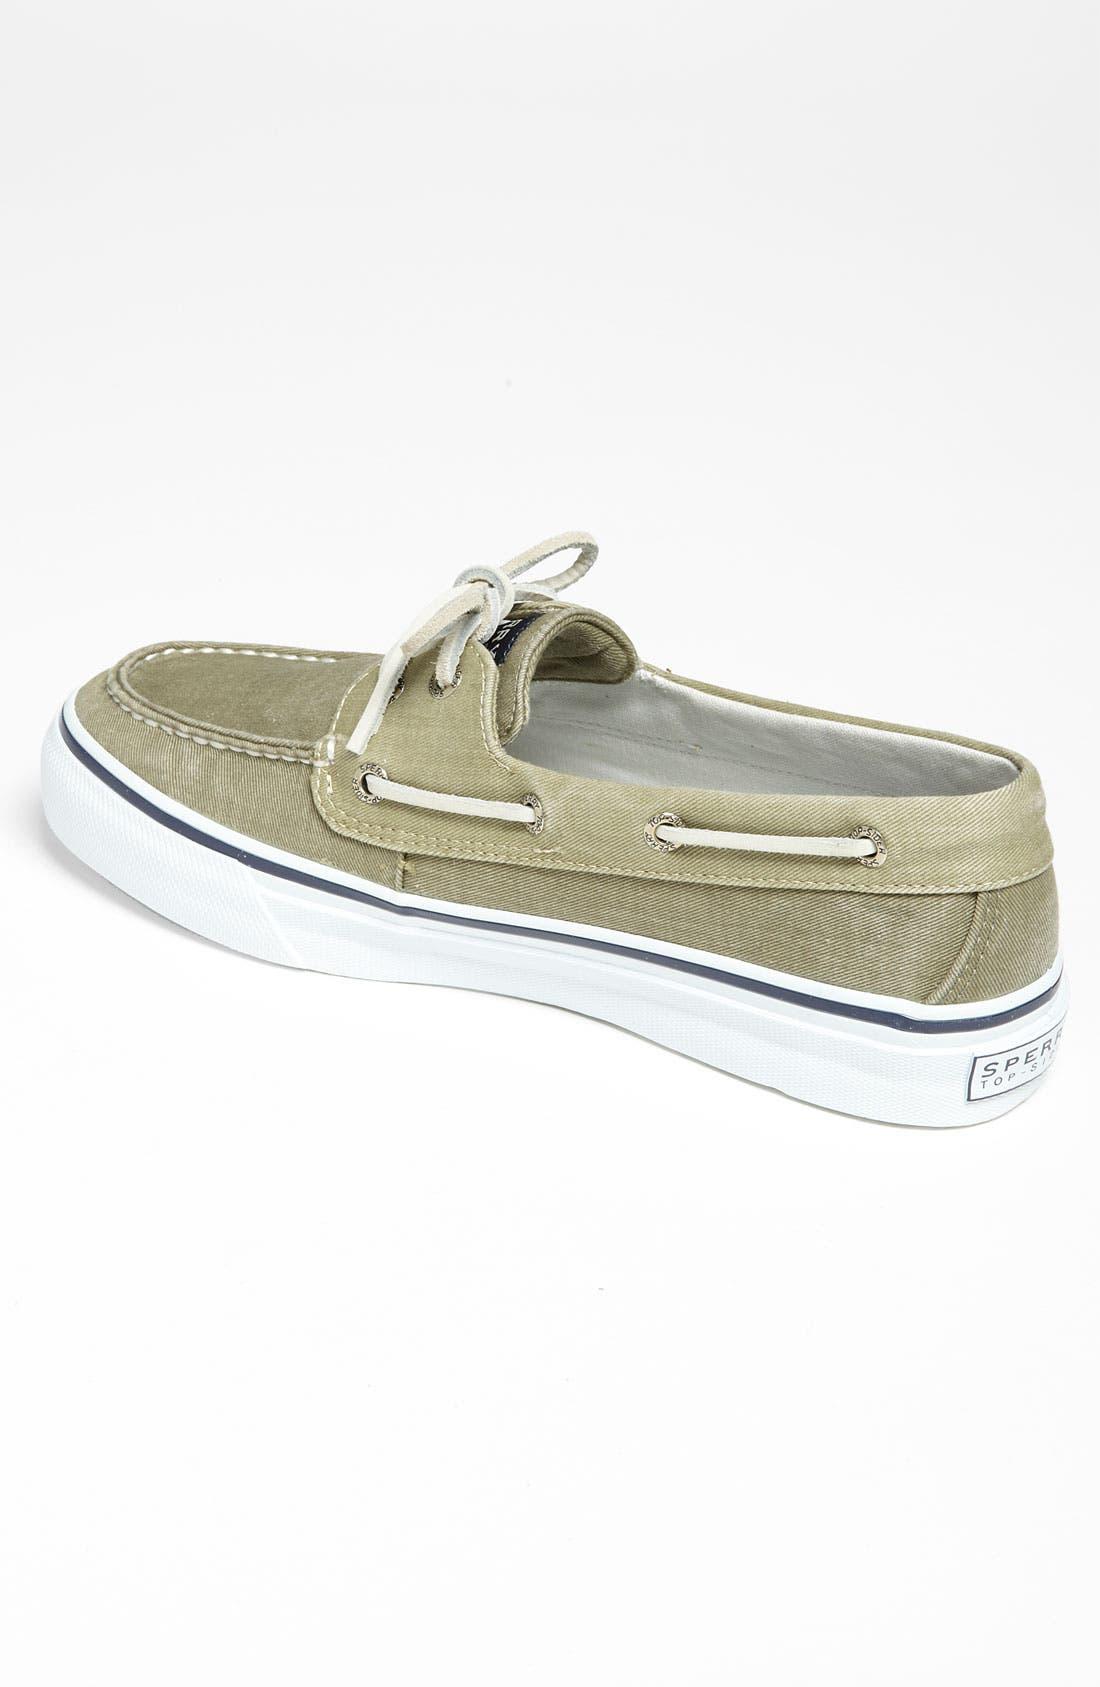 Top-Sider<sup>®</sup> 'Bahama' Boat Shoe,                             Alternate thumbnail 6, color,                             246